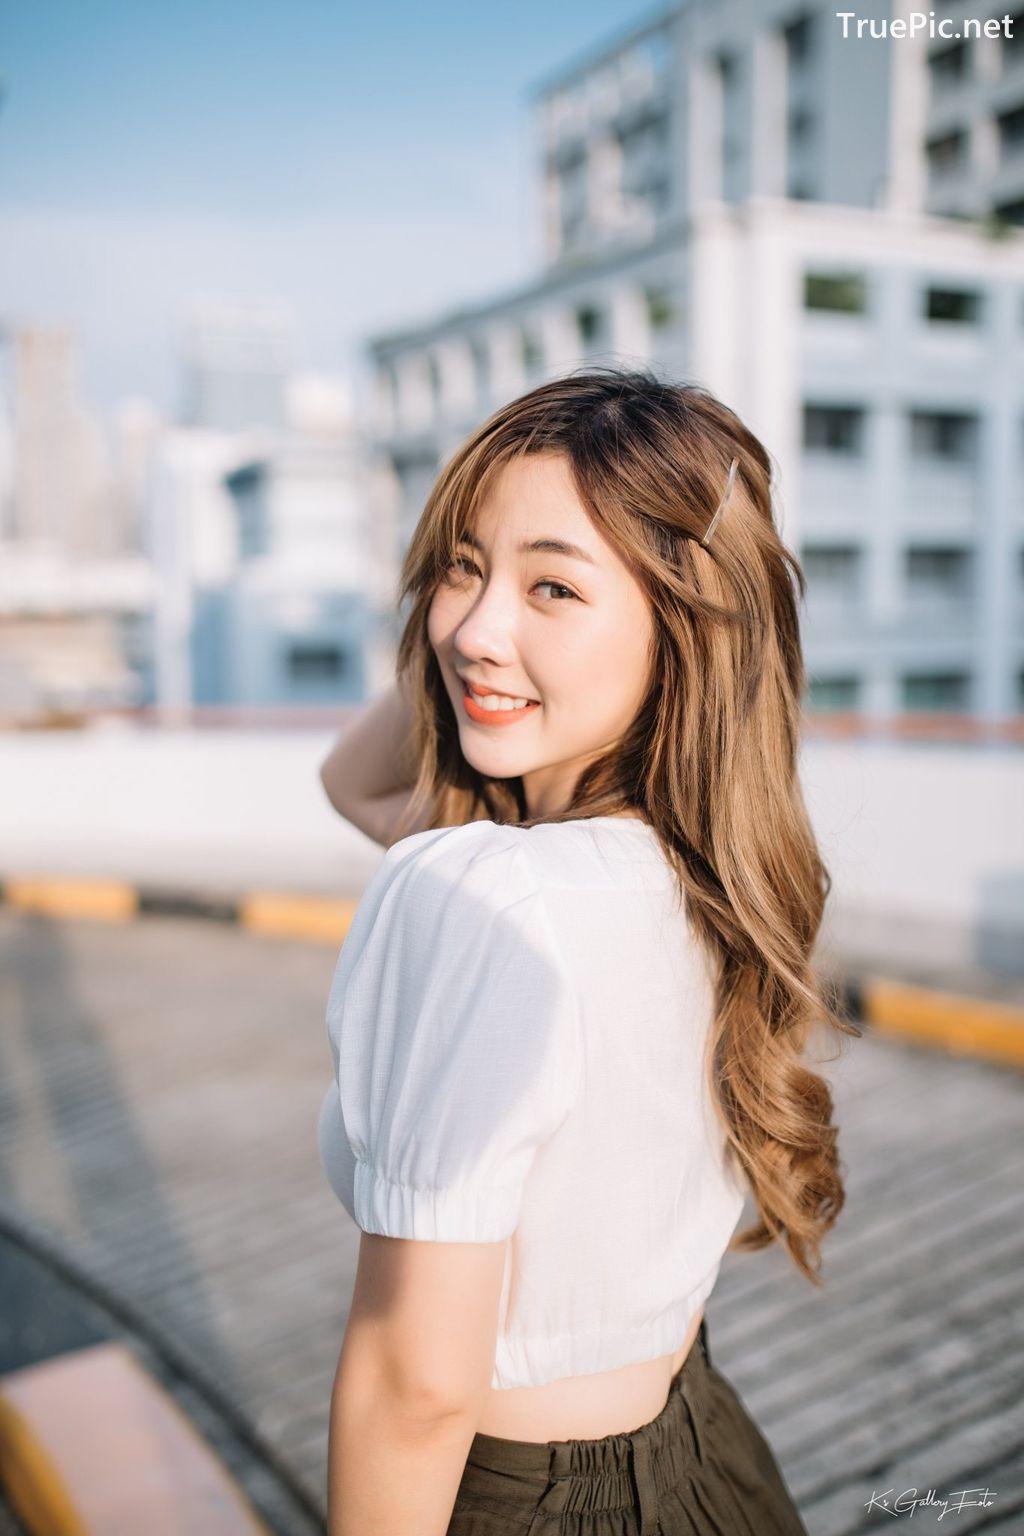 Image Hot Girl Thailand – Nilawan Iamchuasawad – Charming Smile - TruePic.net - Picture-6